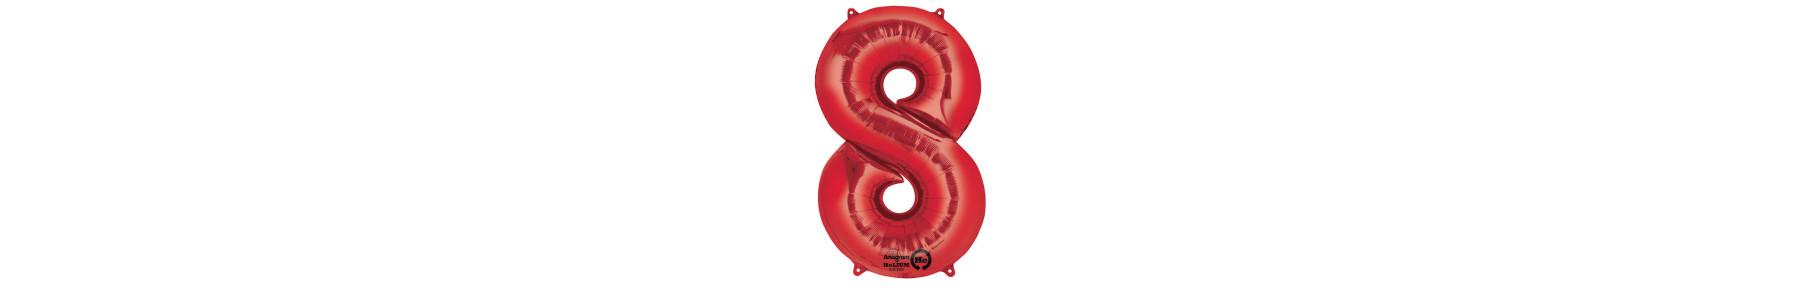 Baloane cifre rosii. Se pot umfla cu heliu